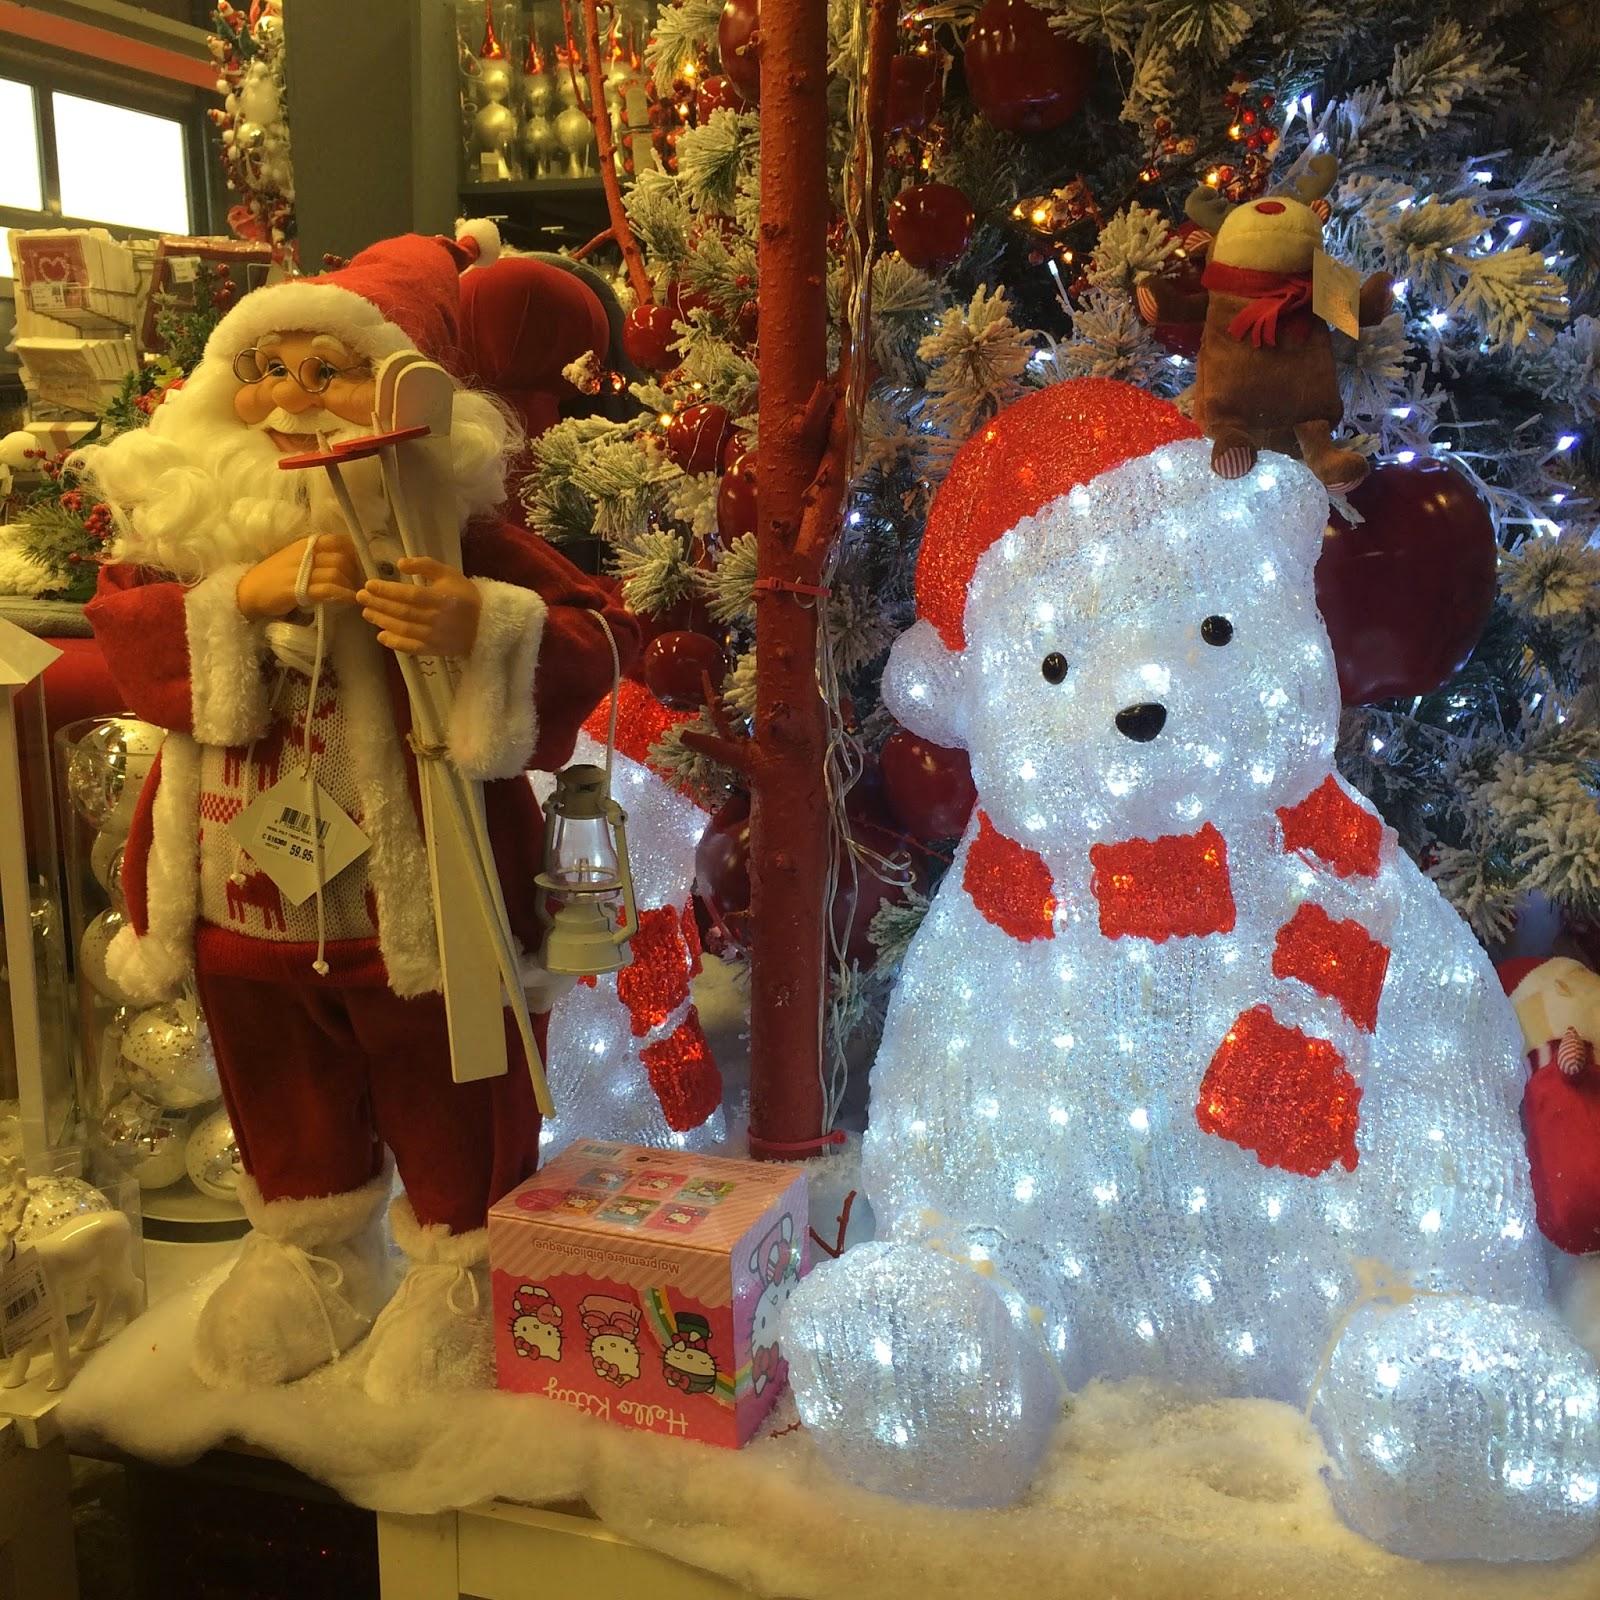 Noël #3: Le sapin